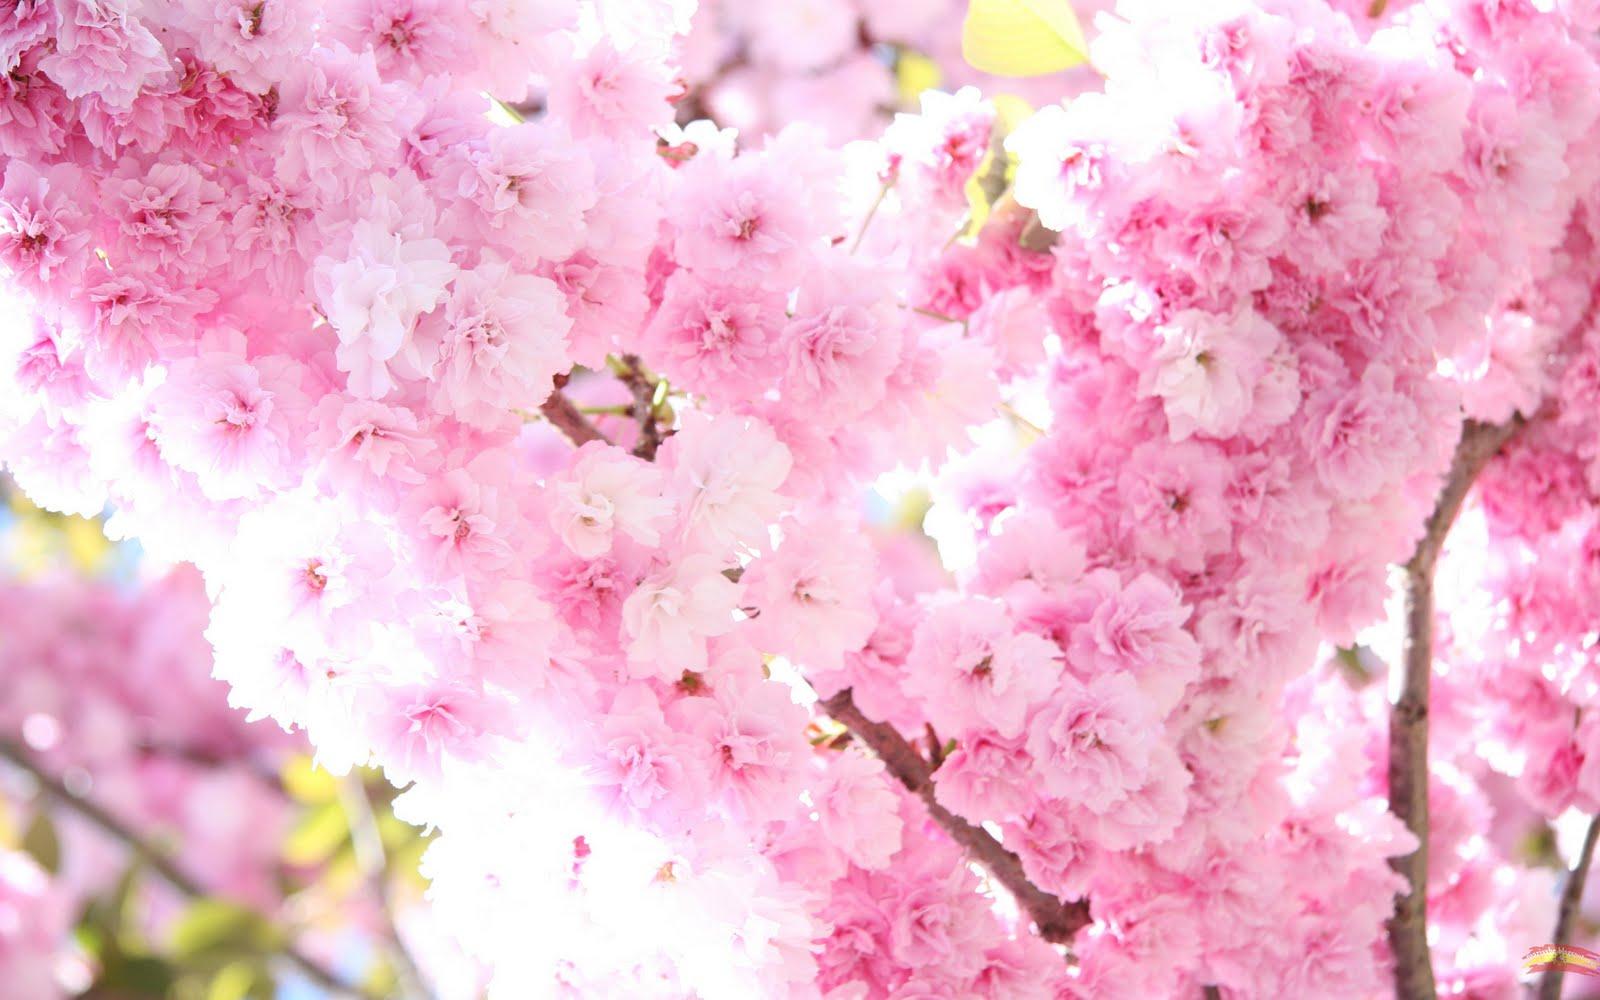 Pink Blossom Wallpaper - Pink Blossom Wallpaper